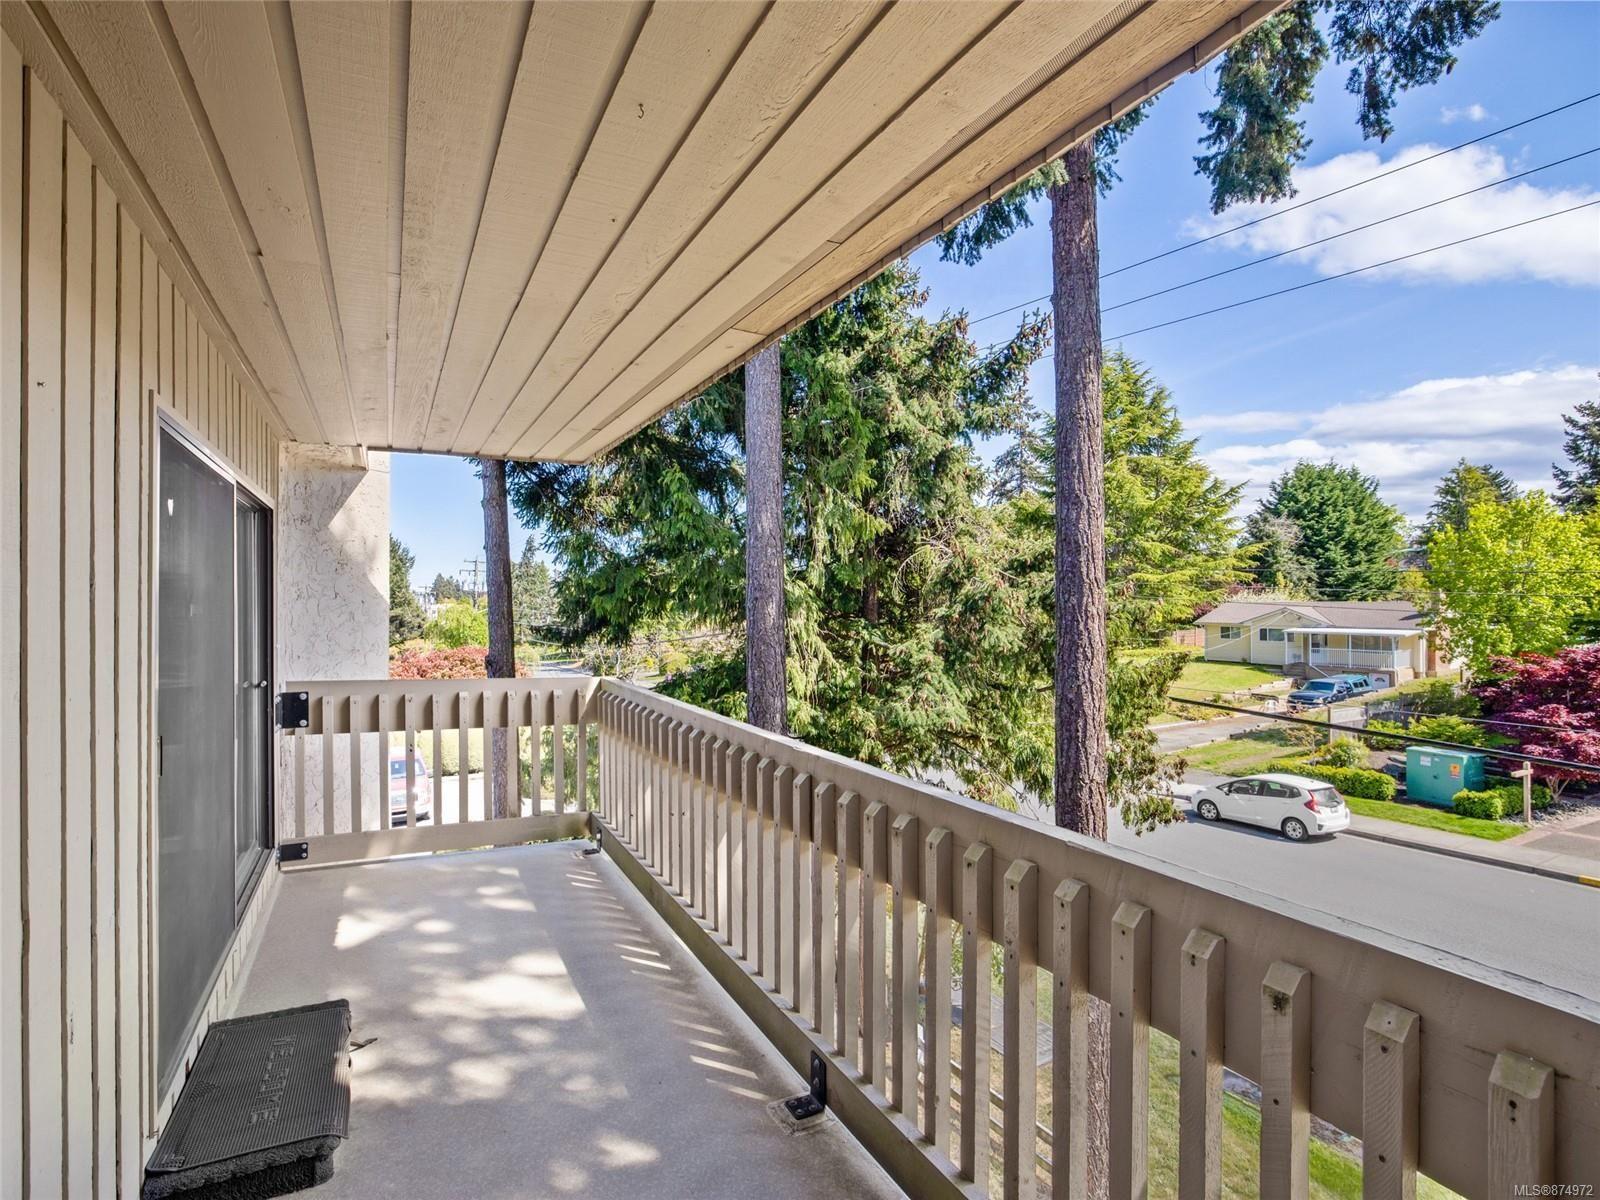 Main Photo: 304 363 Morison Ave in : PQ Parksville Condo for sale (Parksville/Qualicum)  : MLS®# 874972